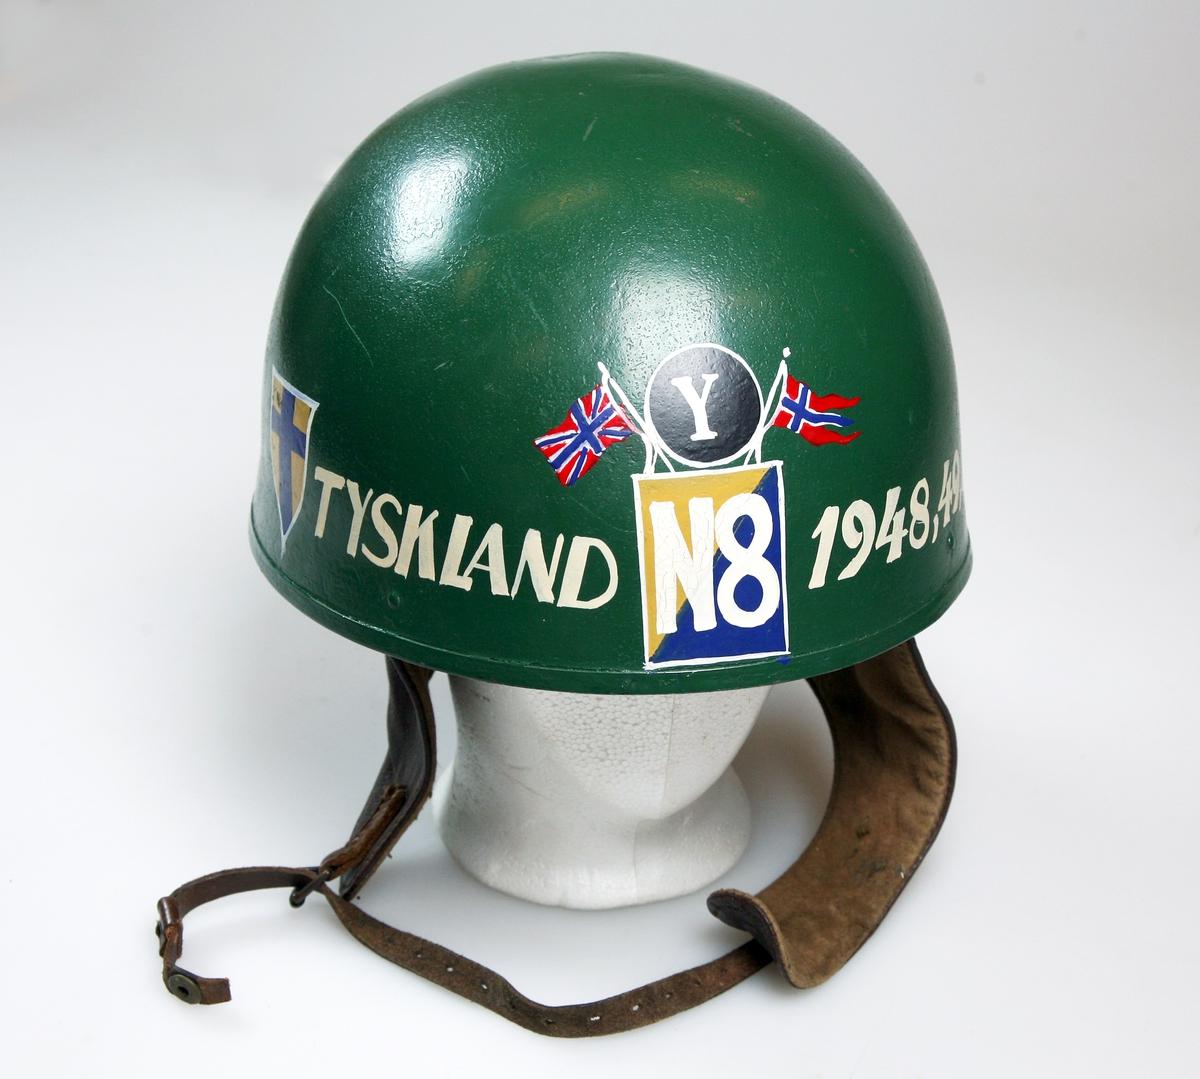 Minnehjelm fra Tysklandsbrigaden.